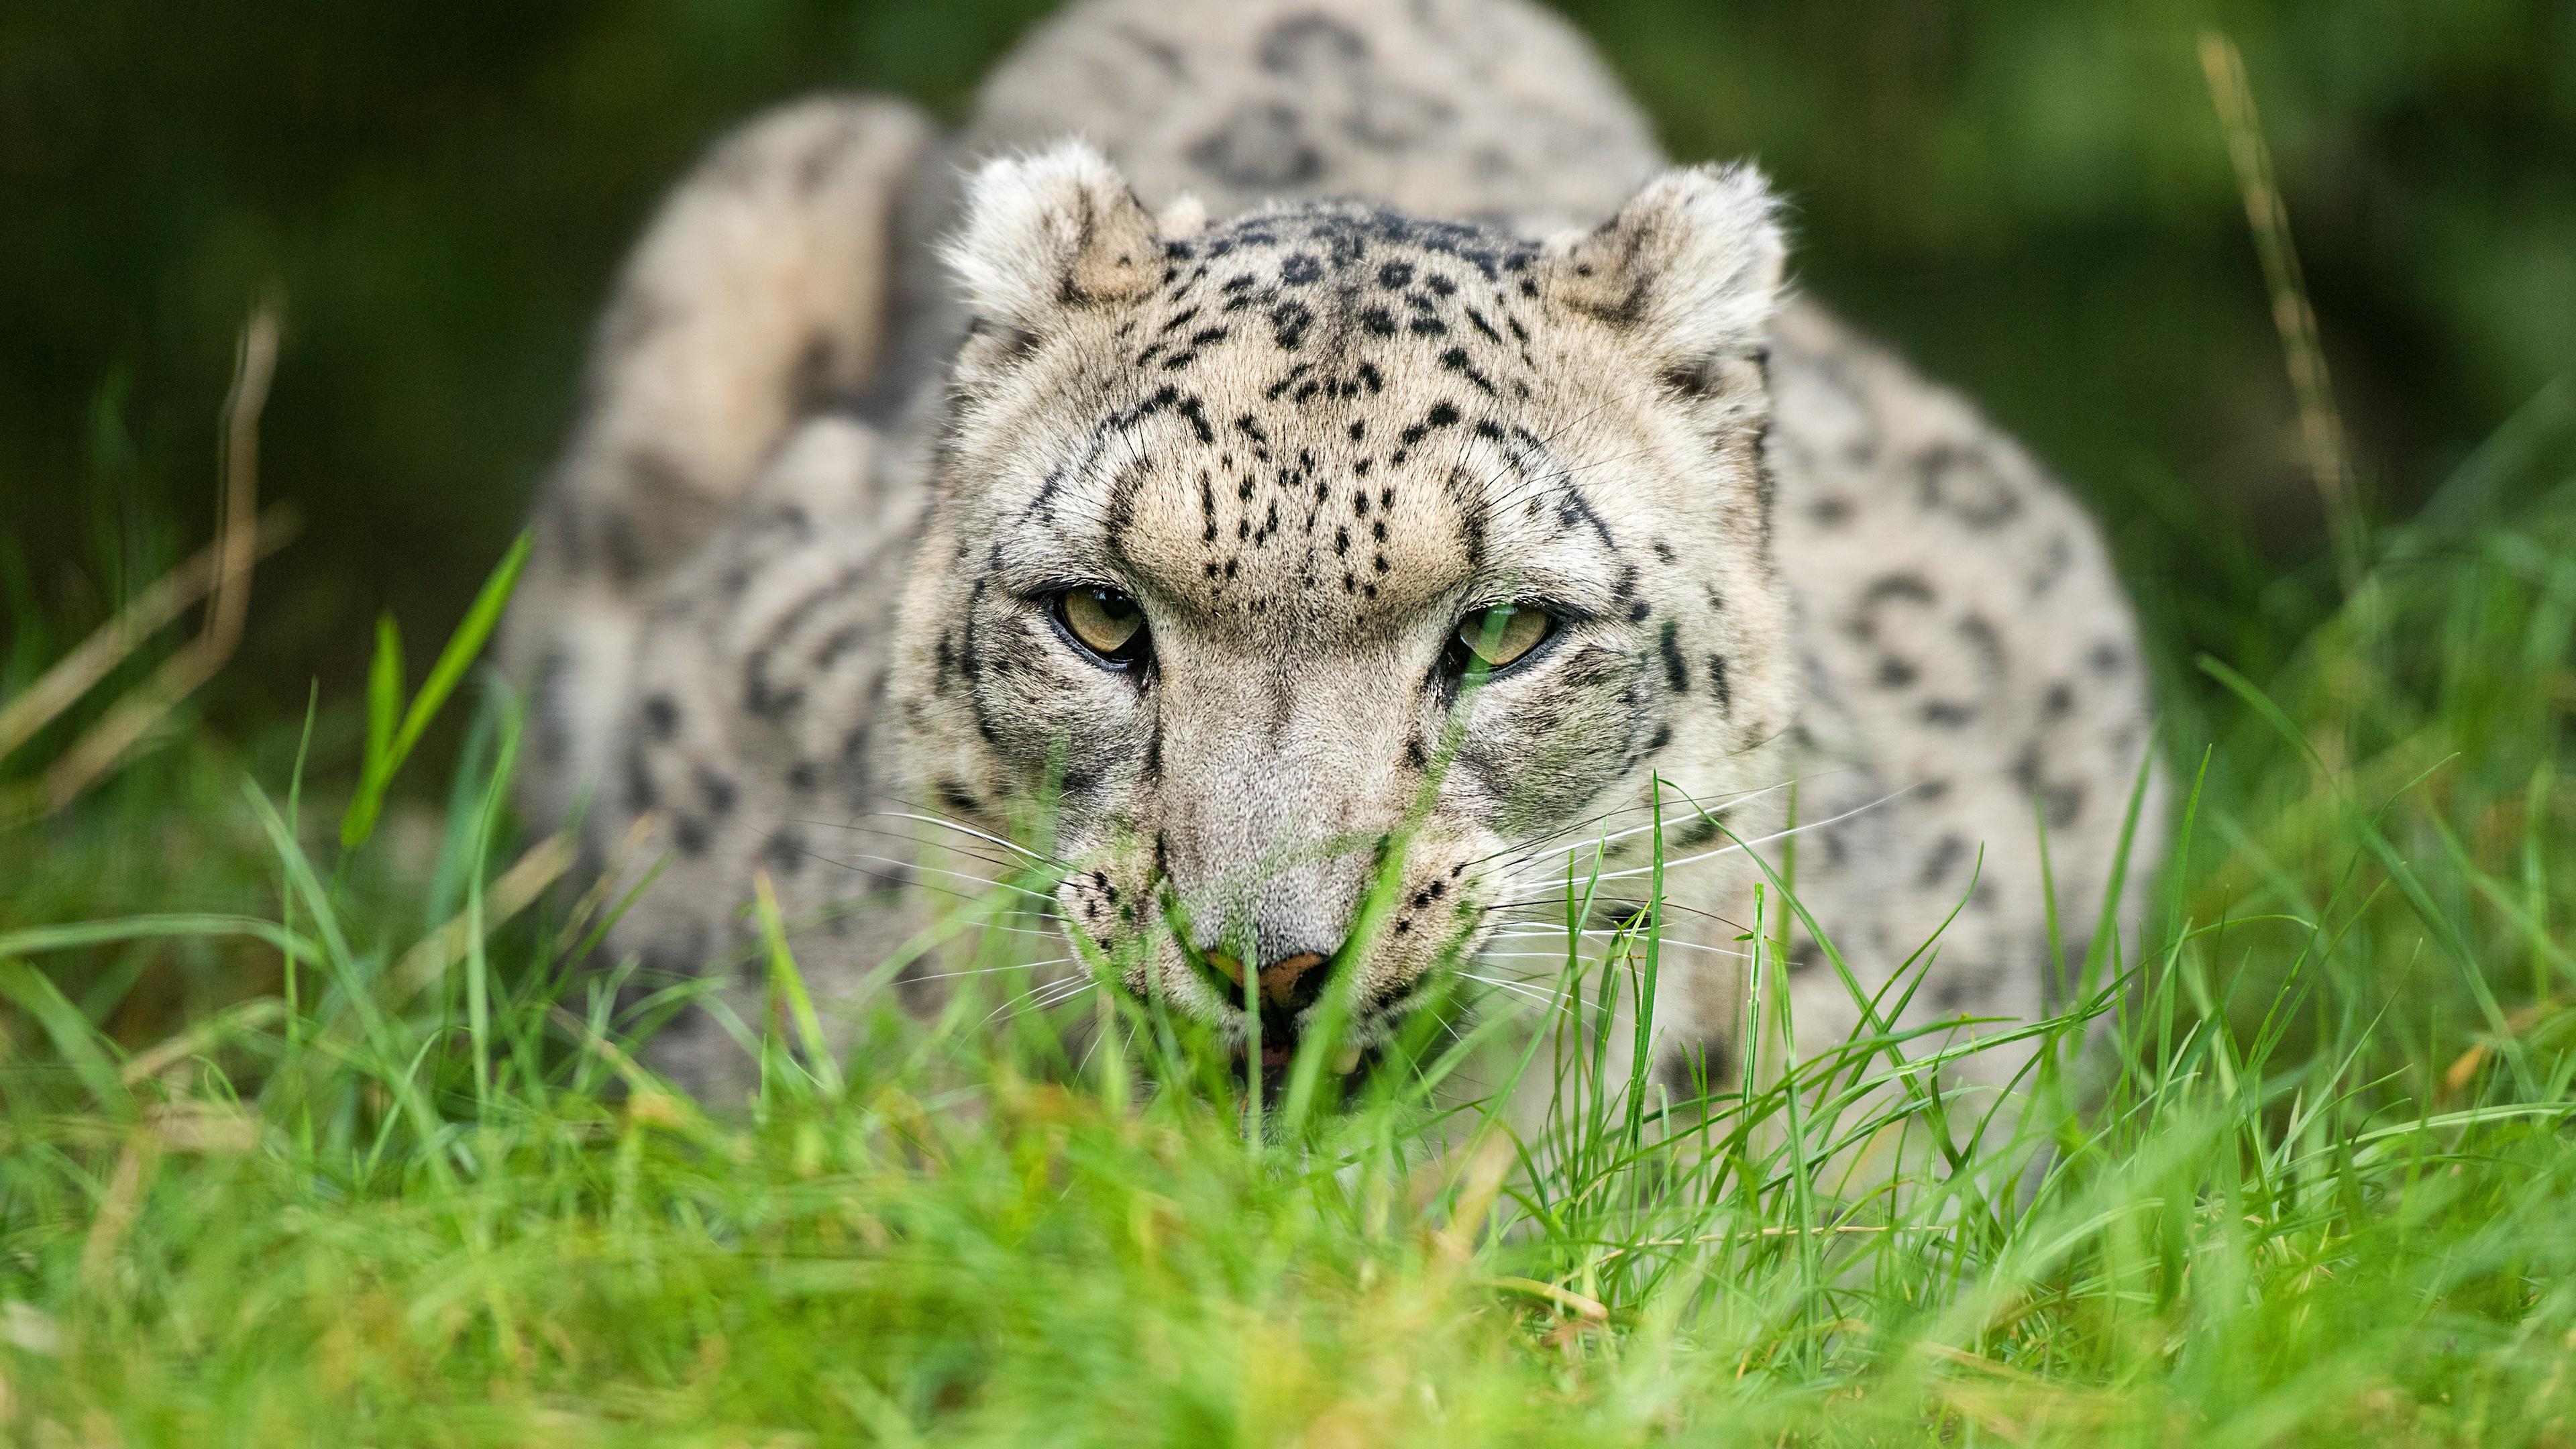 snow leopard glance 1574938188 - Snow Leopard Glance -